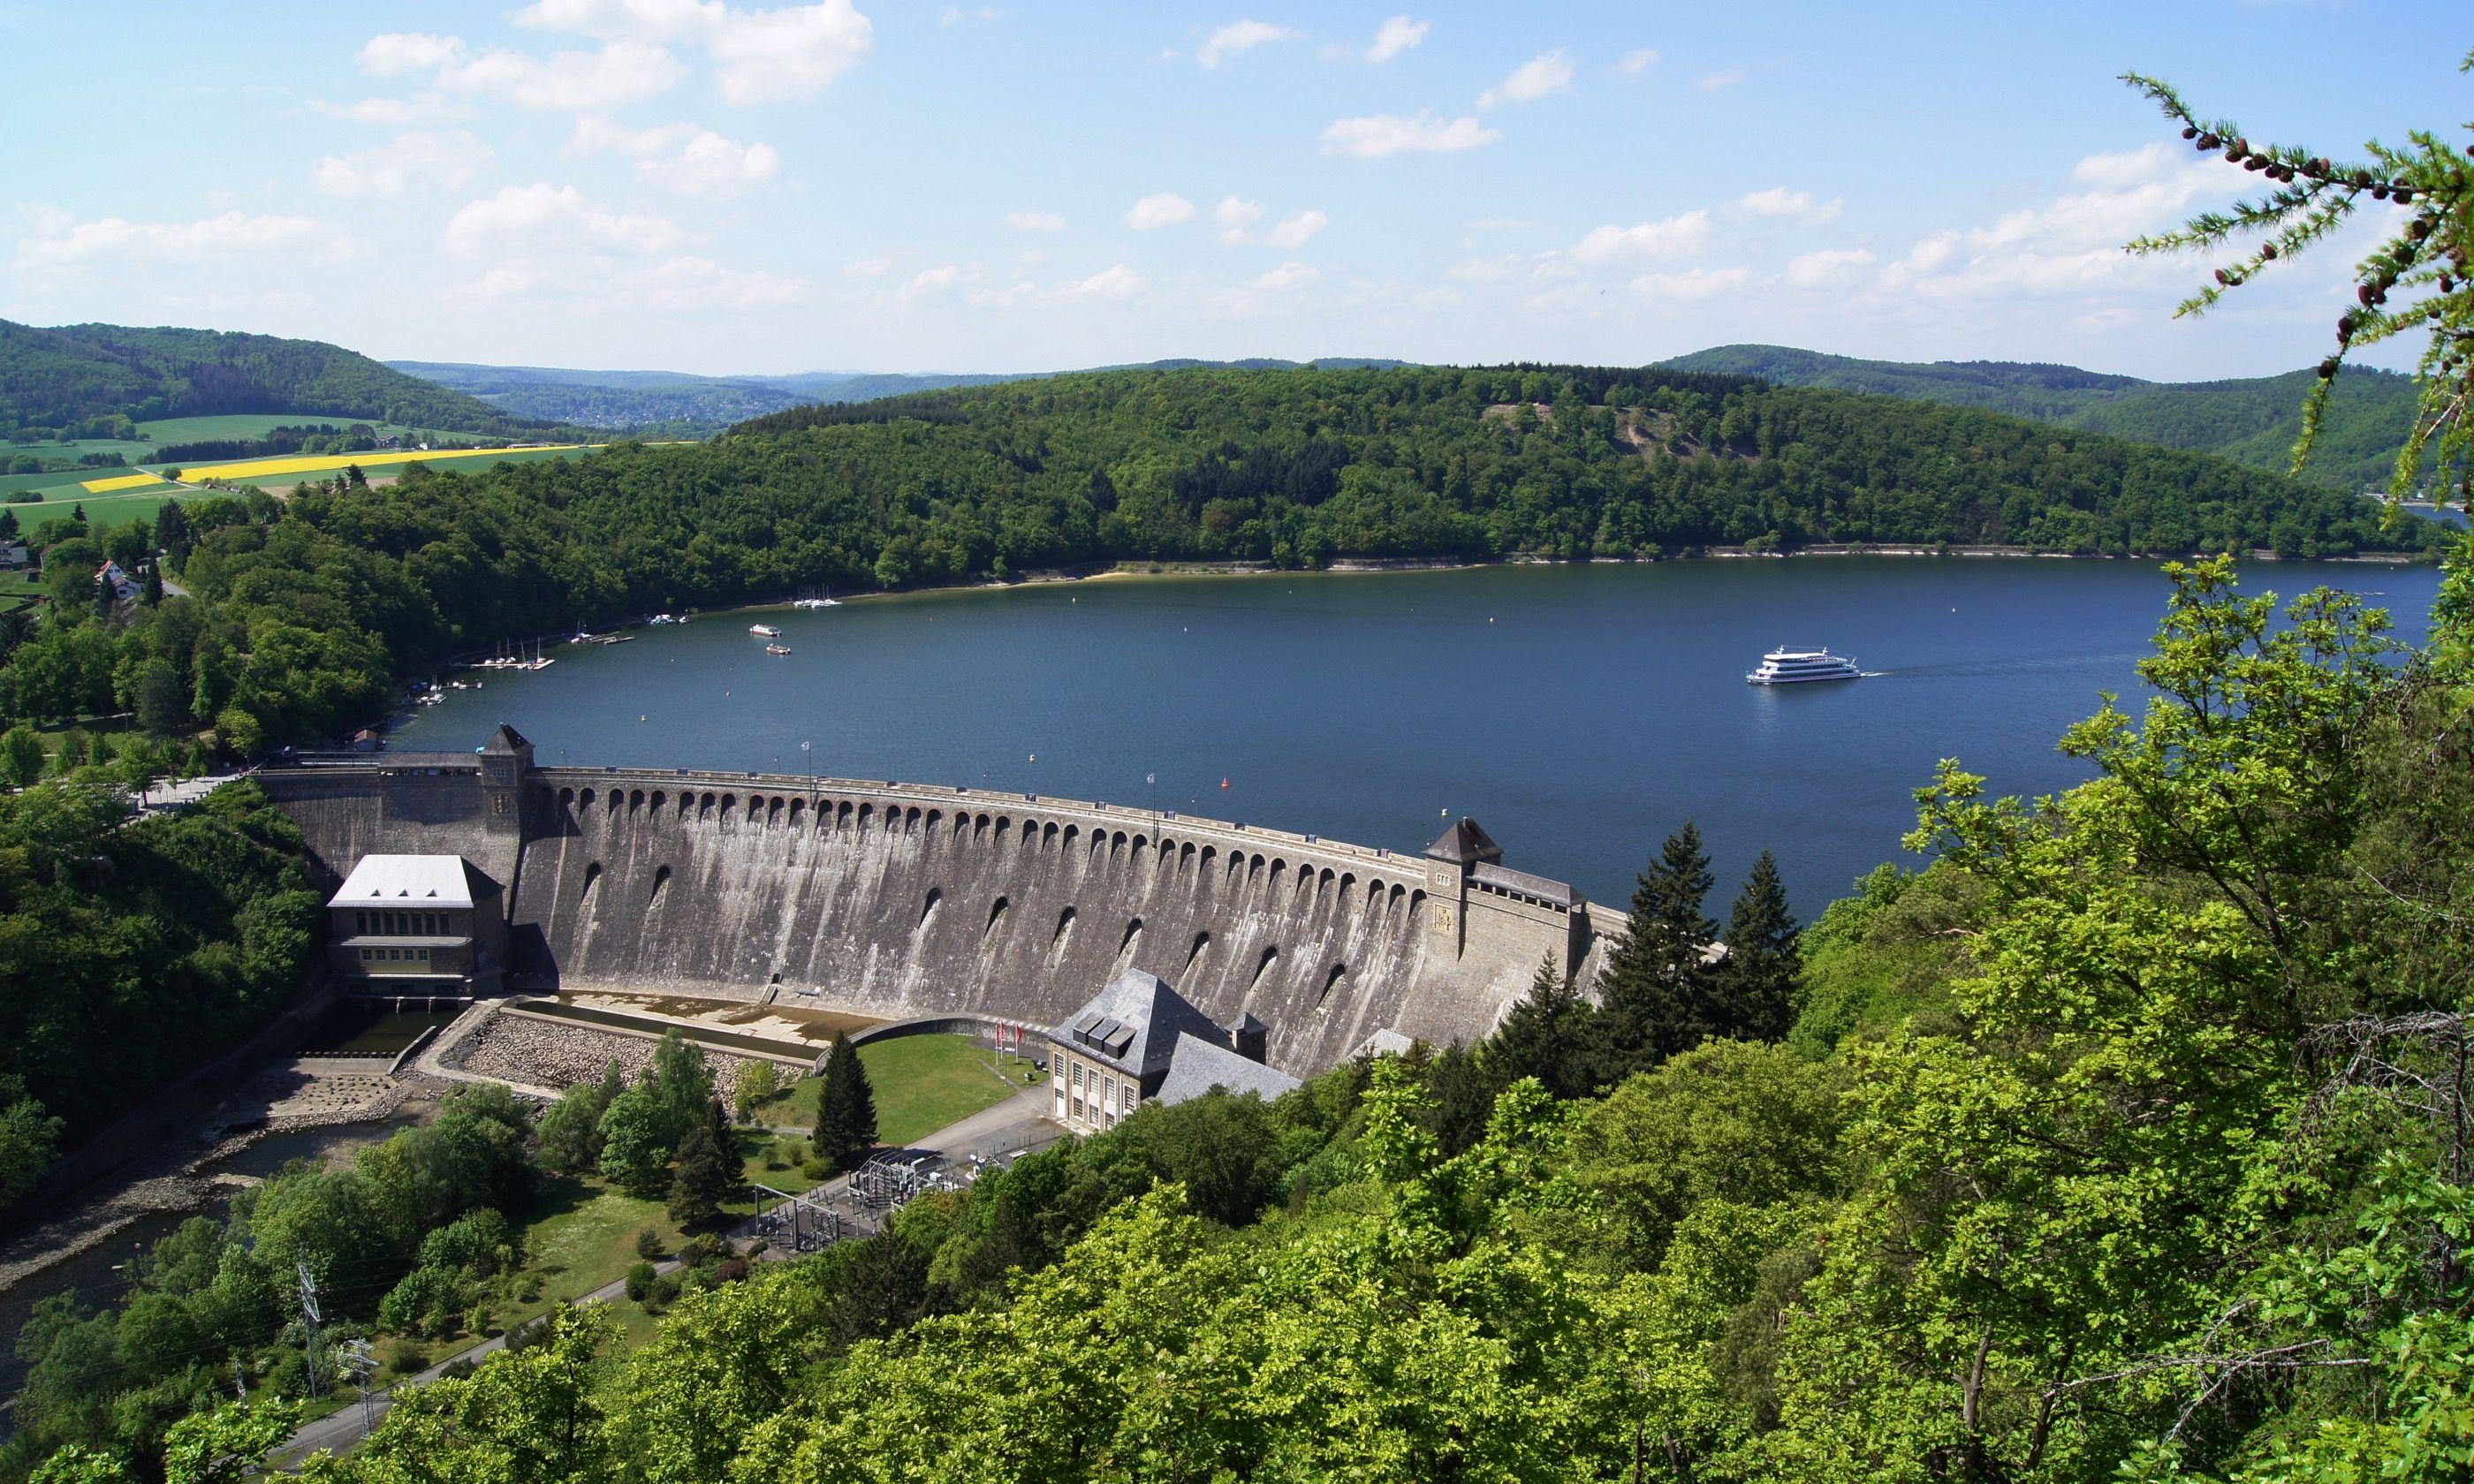 Kellerwald Adersee Dam (German National Tourist Board)